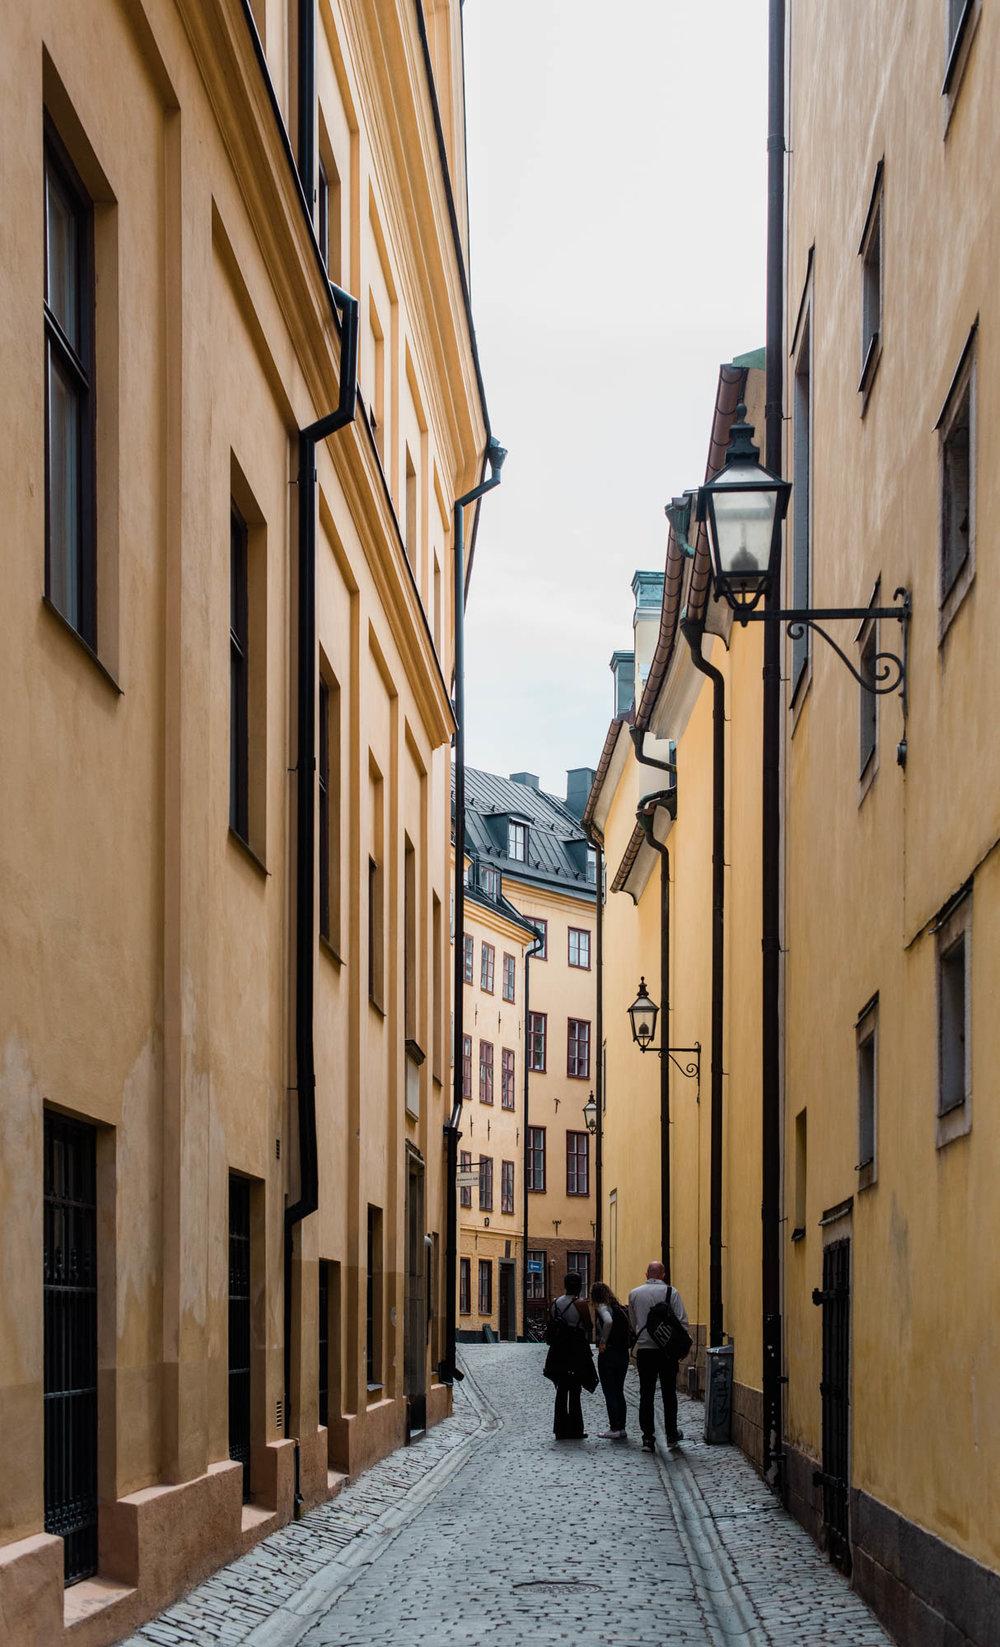 Web-hannah puechmarin-sweden-9133.jpg